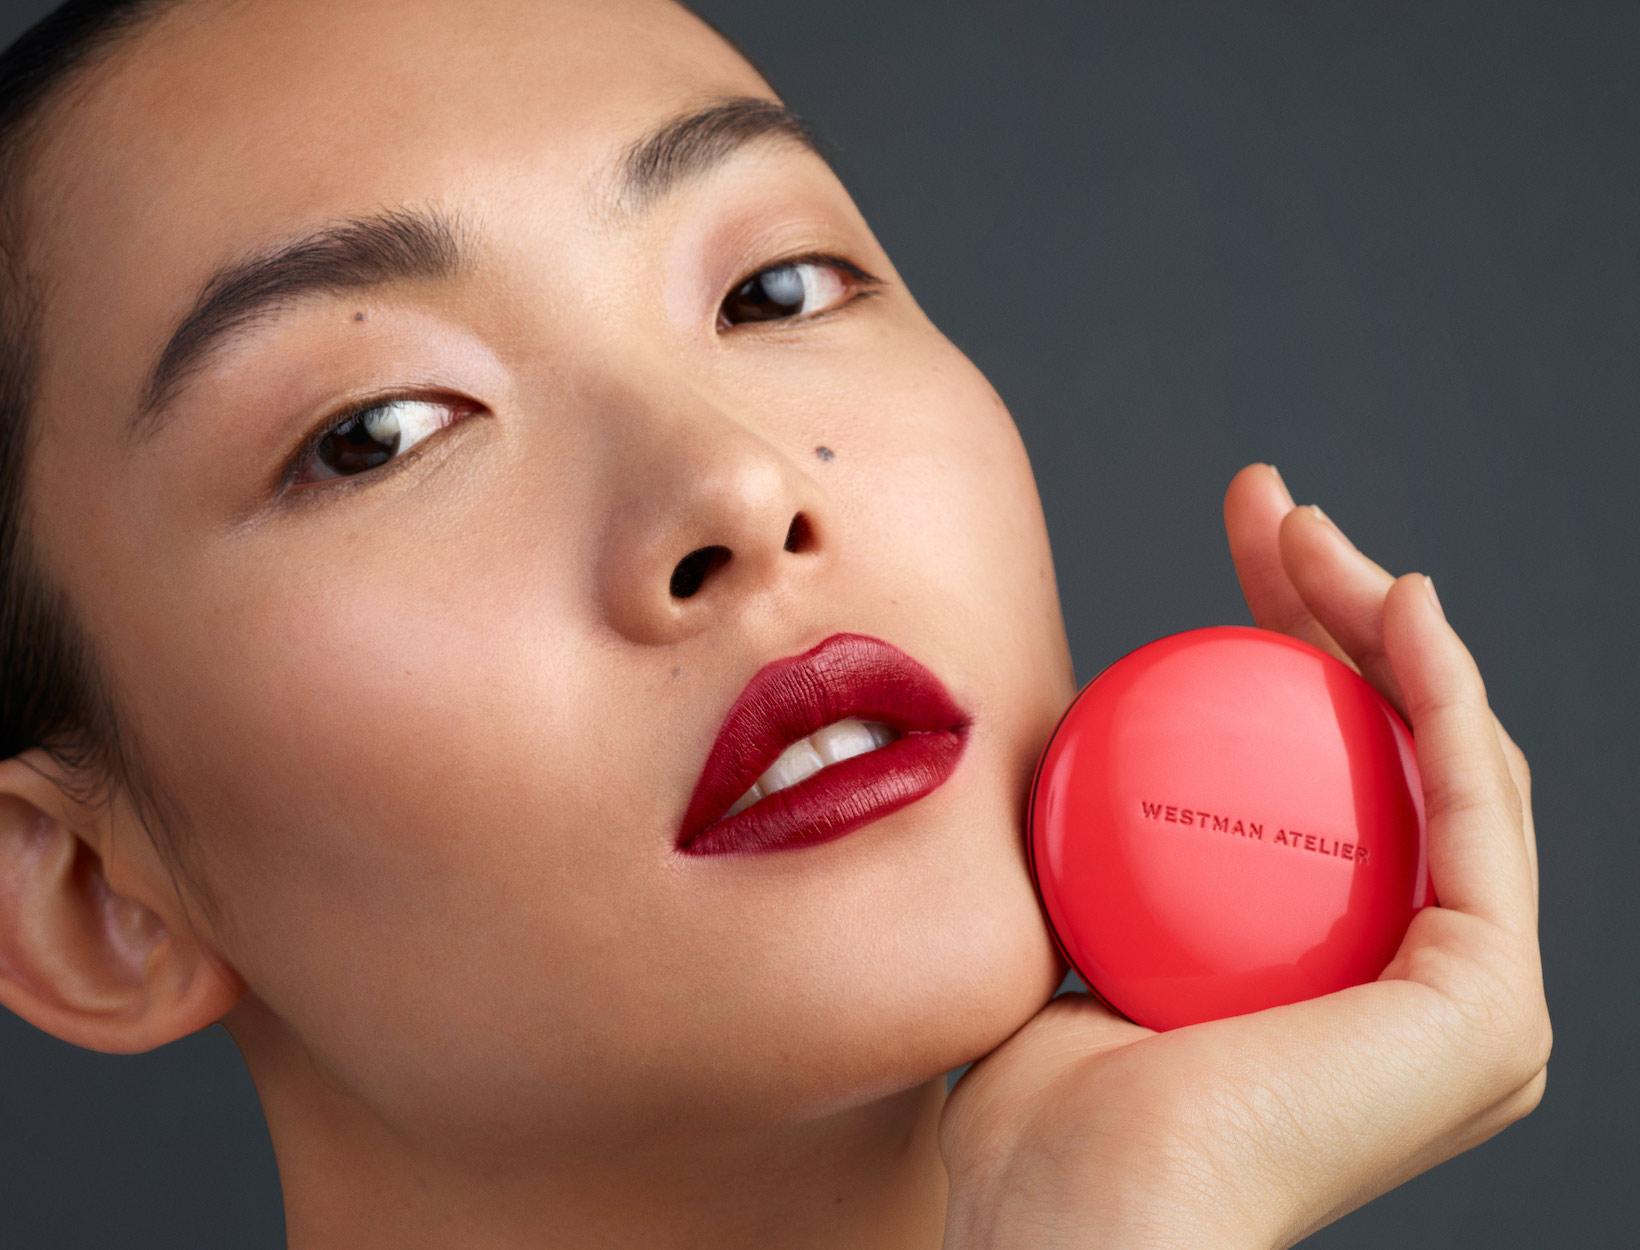 girl wearing lipstick